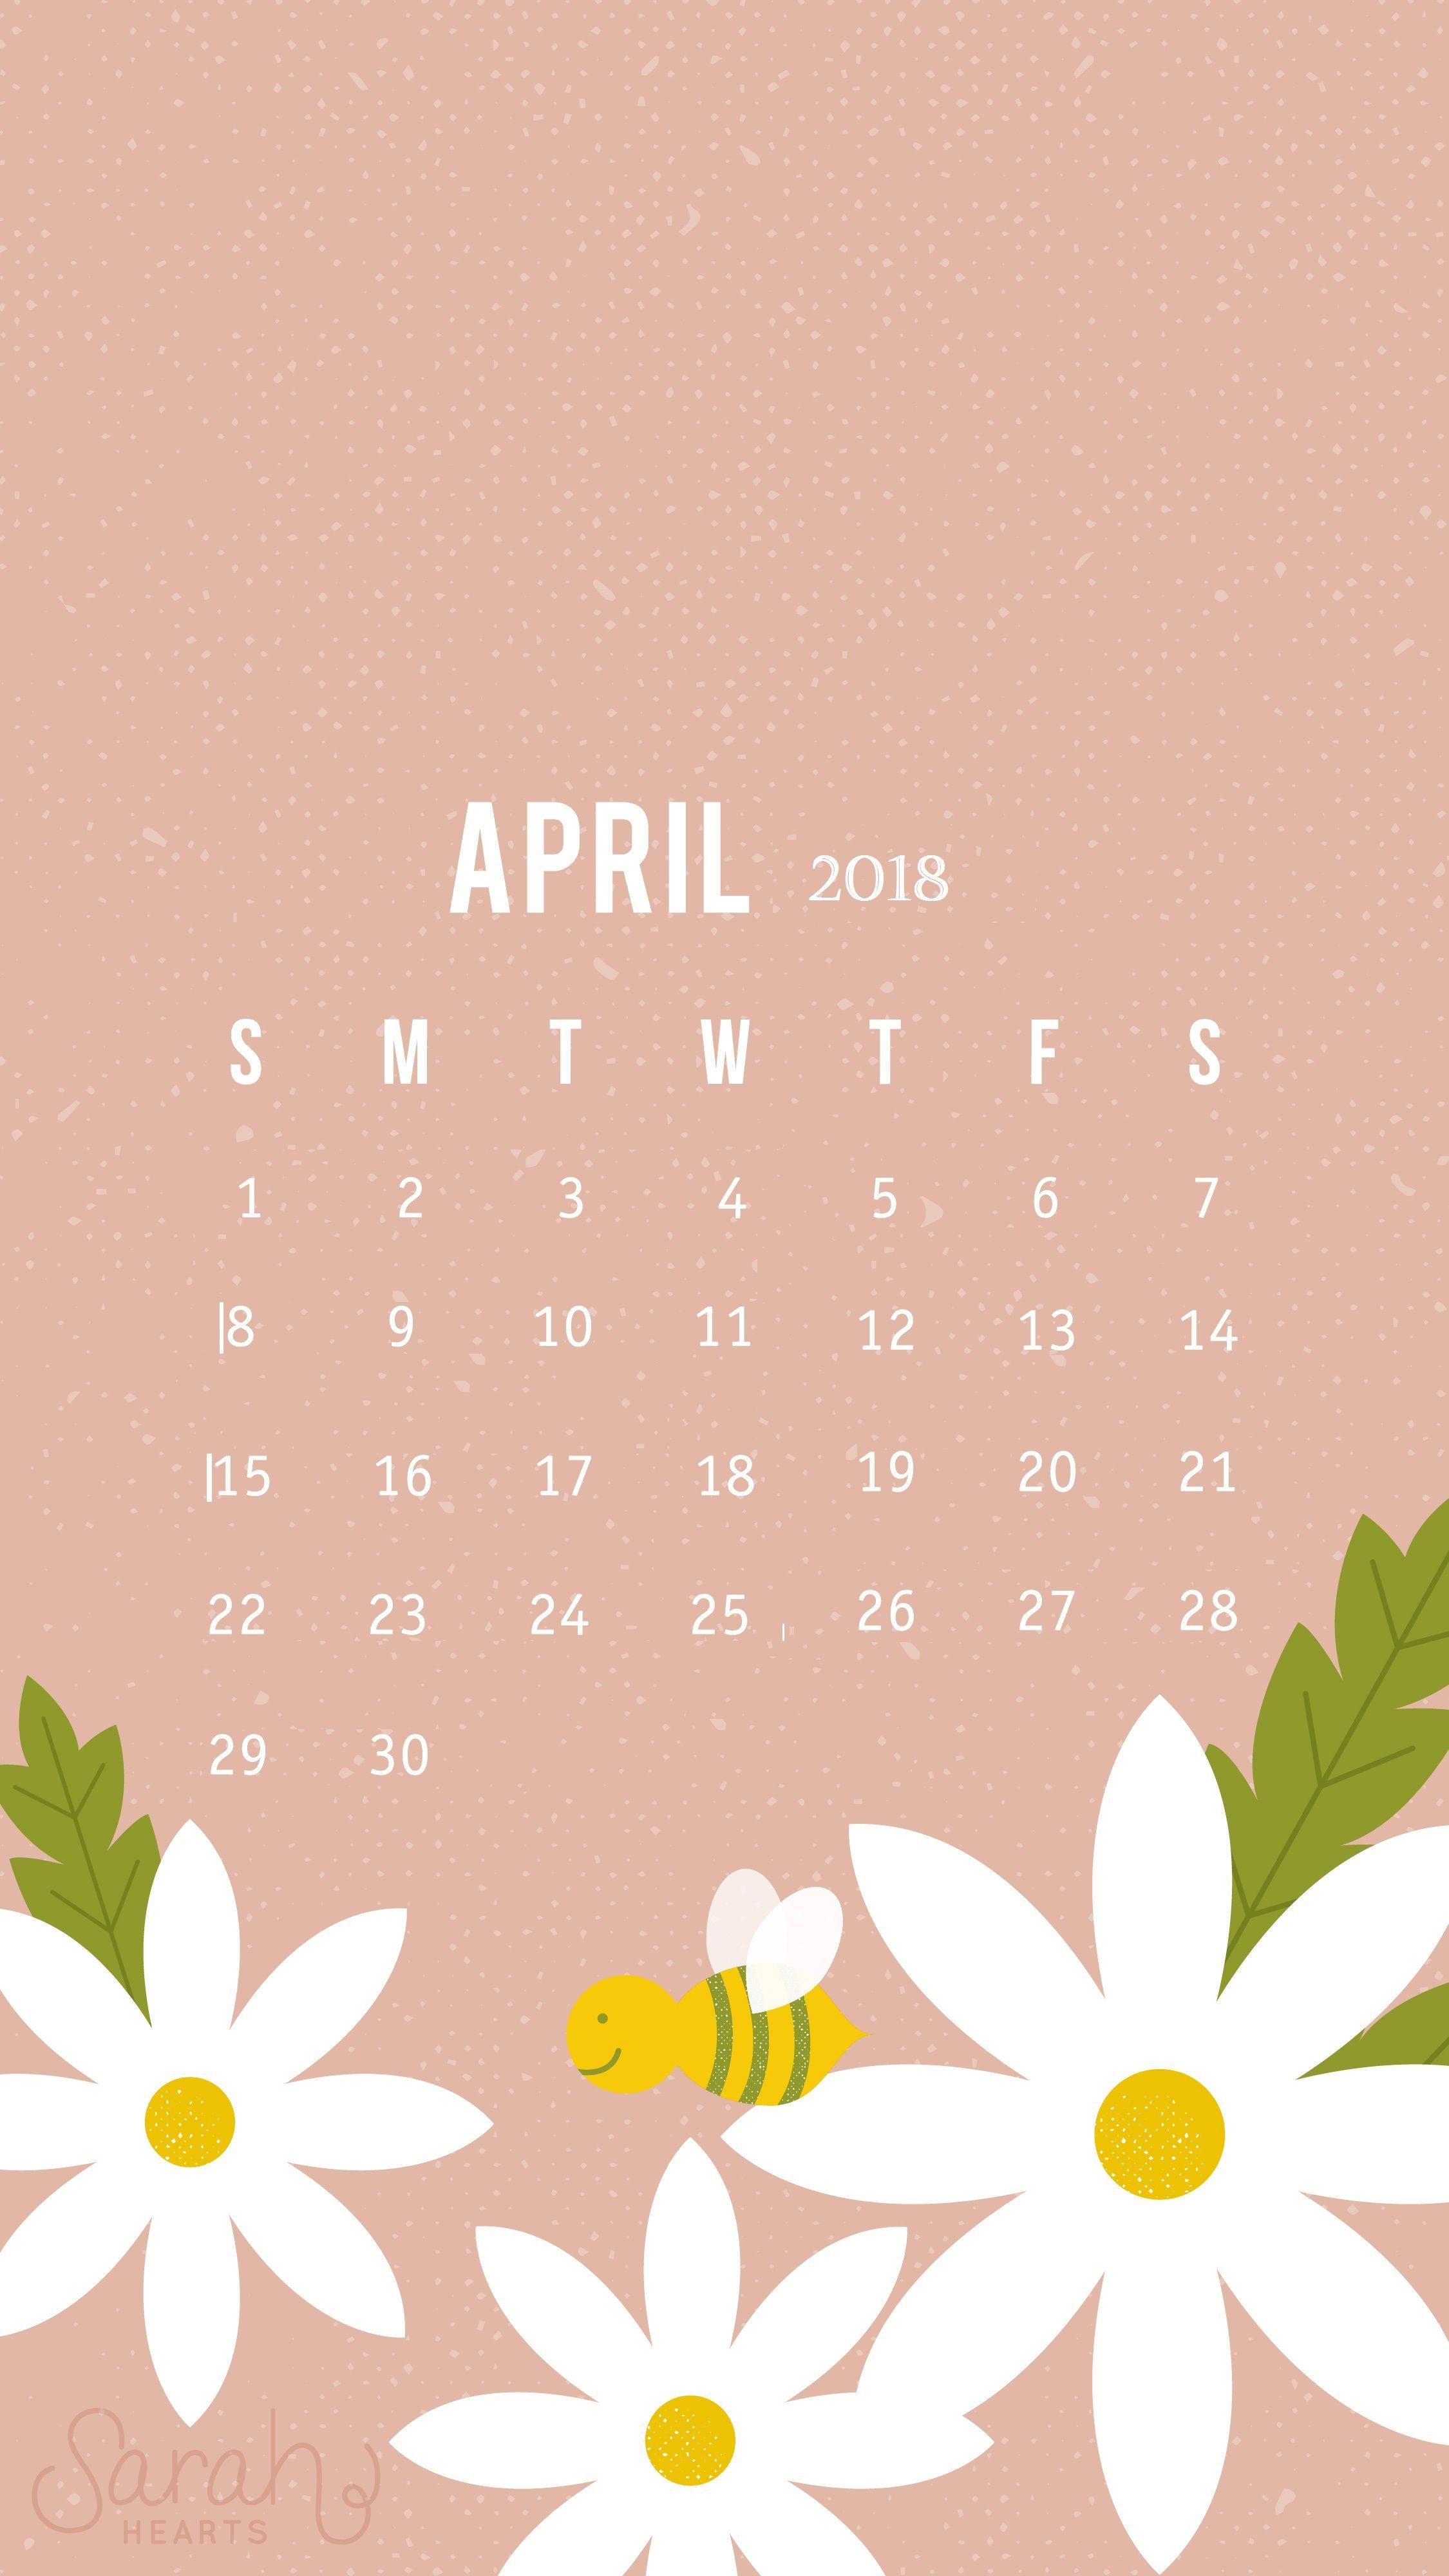 Cute April 2018 iPhone Calendar Wallpaper Calendar 2018 2250x4000